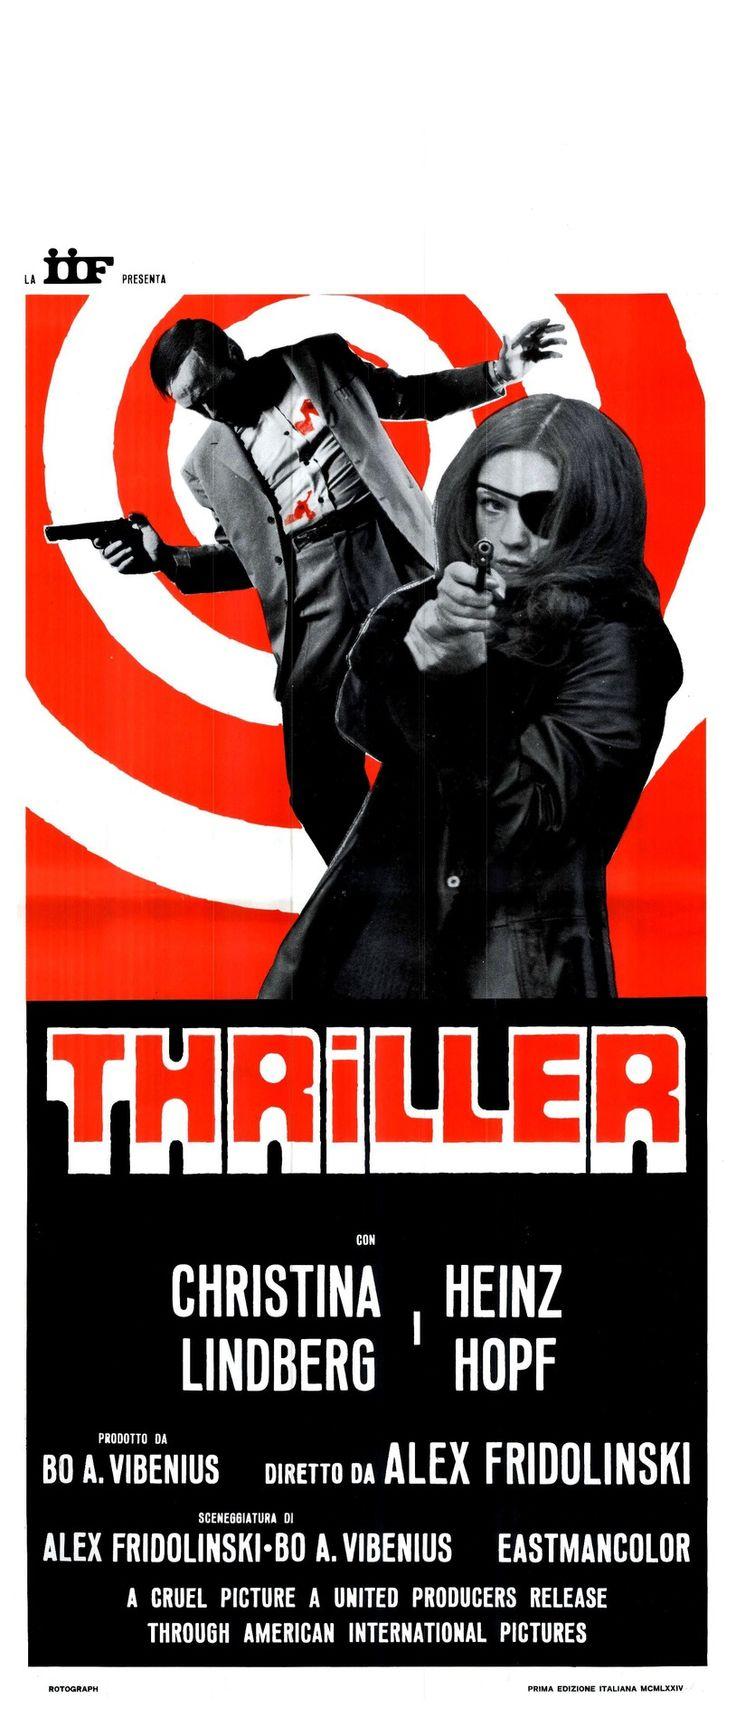 Thriller a cruel picture full movie